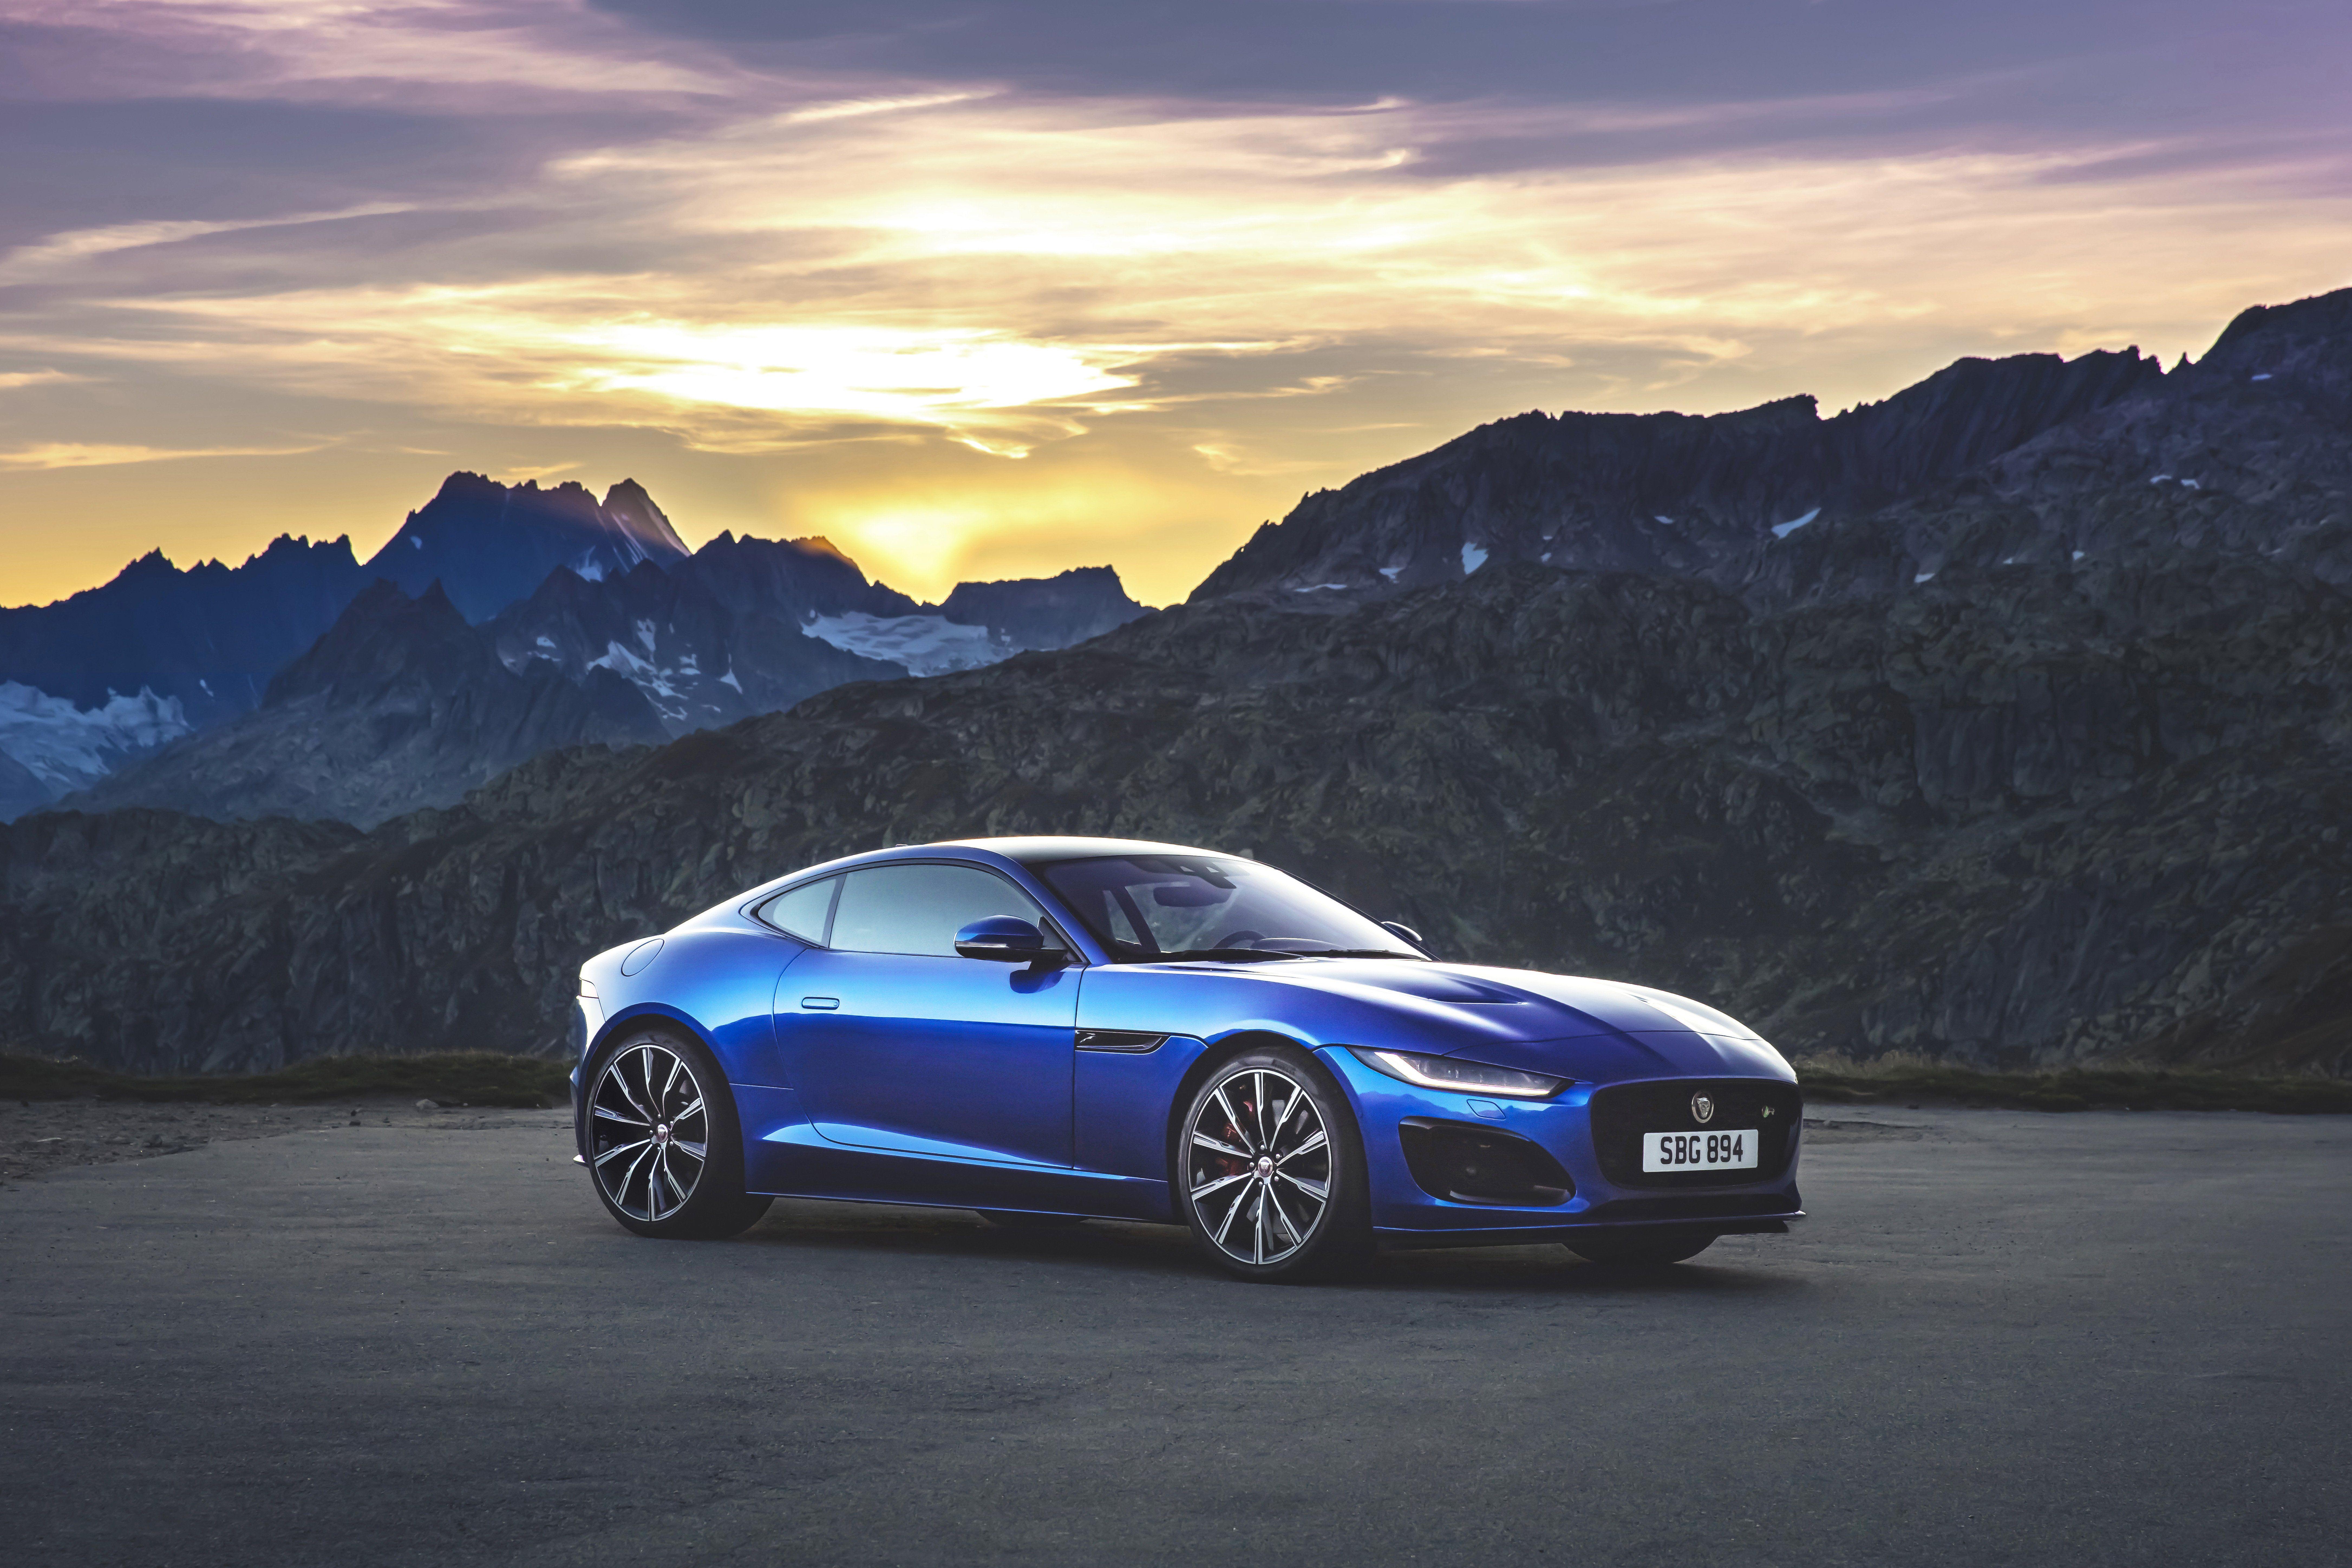 Jaguar F Type Wallpapers Top Free Jaguar F Type Backgrounds Wallpaperaccess